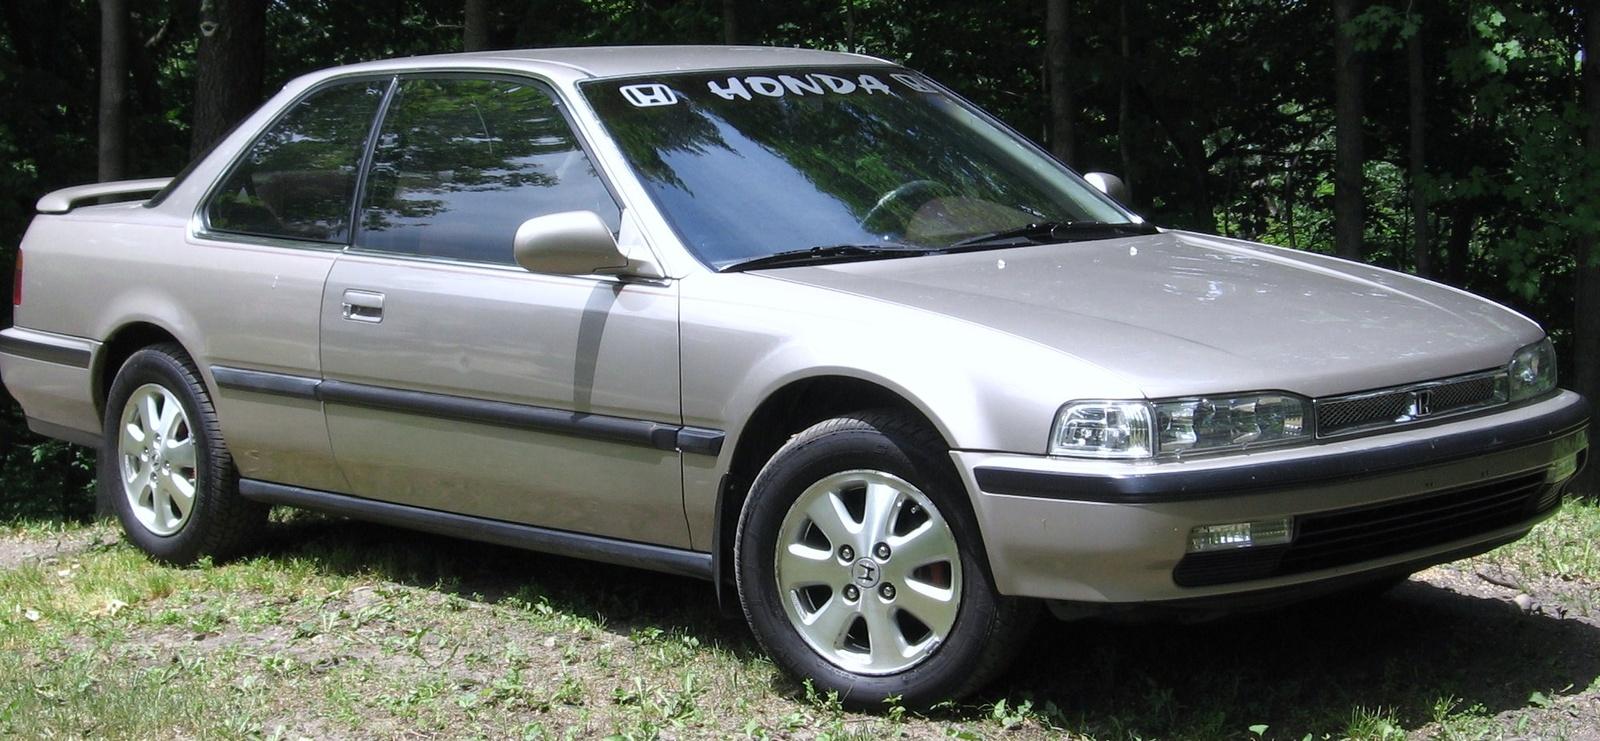 High Quality 1991 Honda Accord #11 Honda Accord #11